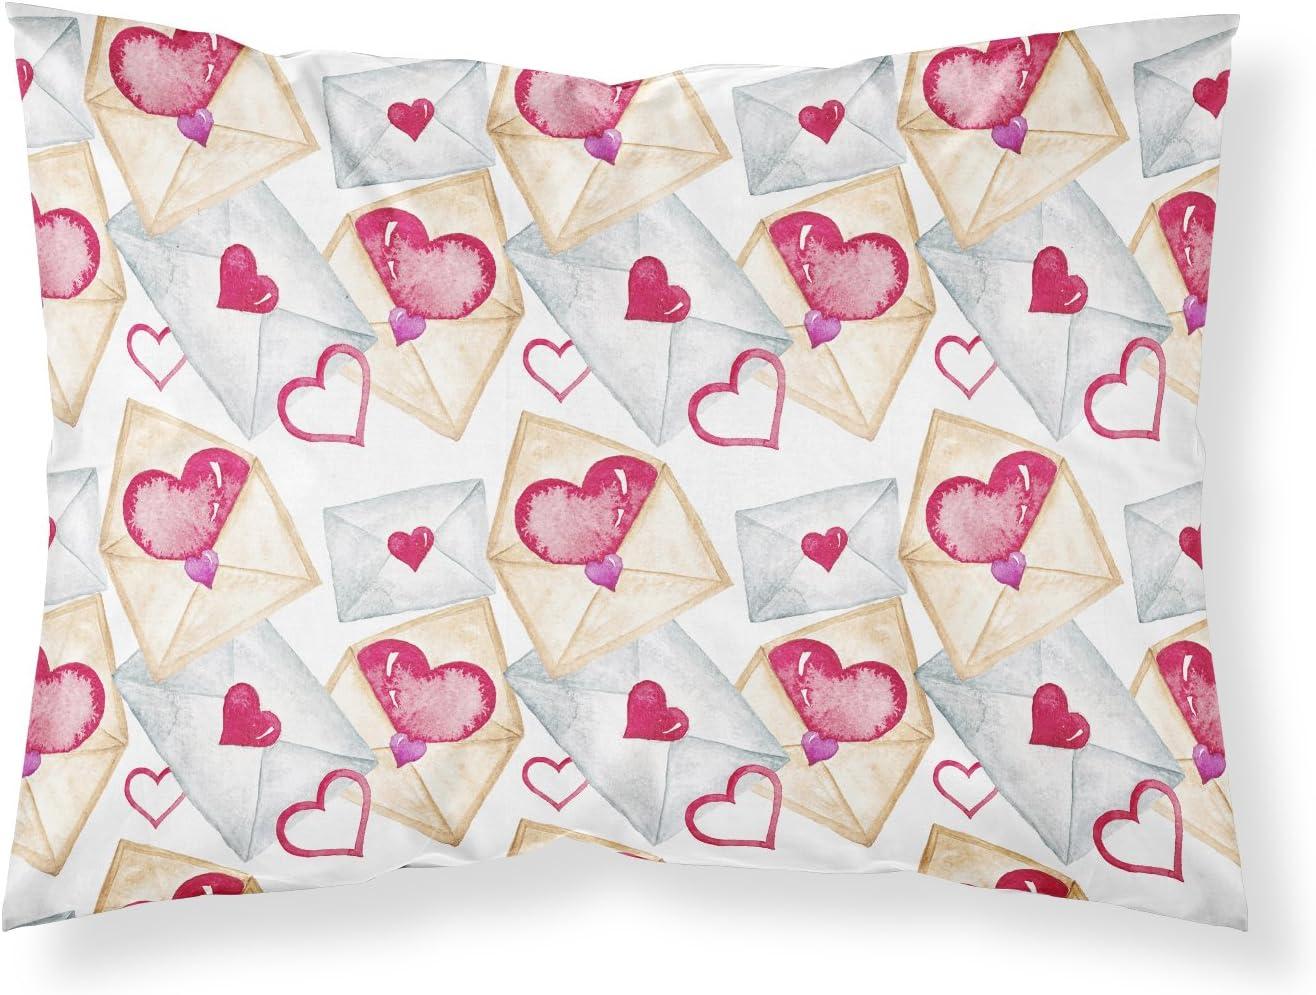 Caroline's Treasures BB7569PILLOWCASE Watercolor Love Letters Fabric Standard Pillowcase, Standard, Multicolor